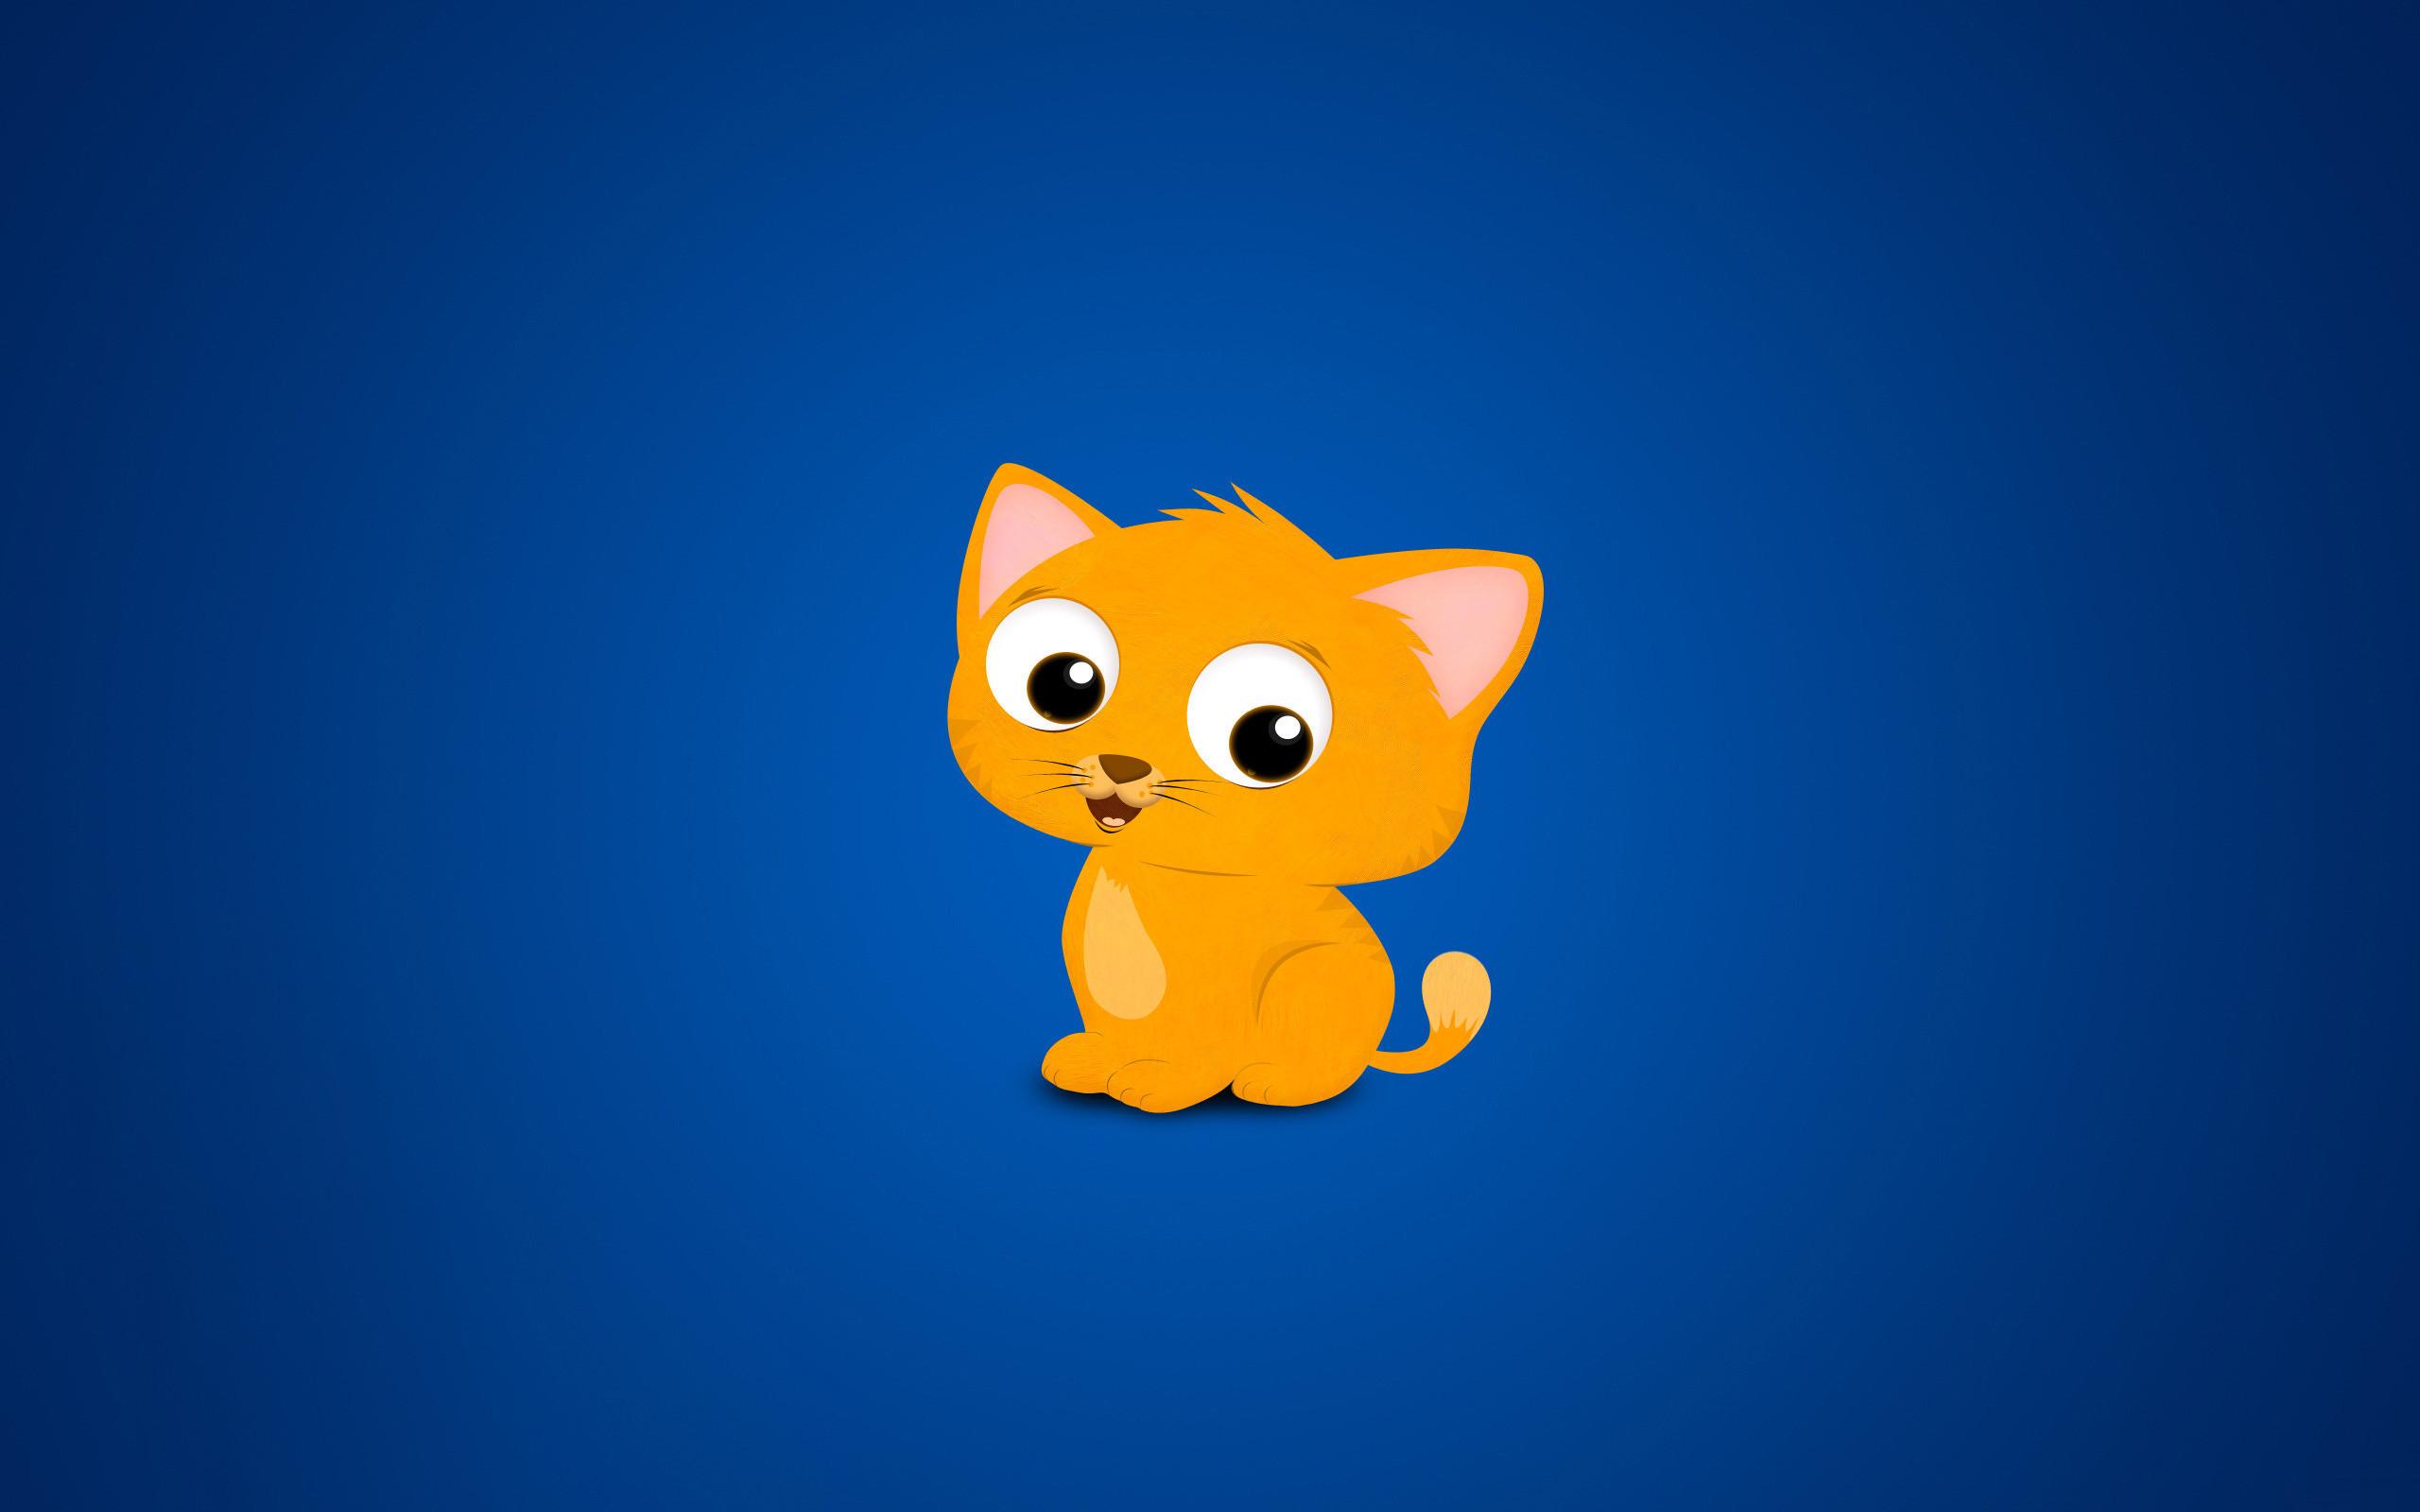 CUte Kitten Cartoon #6950096